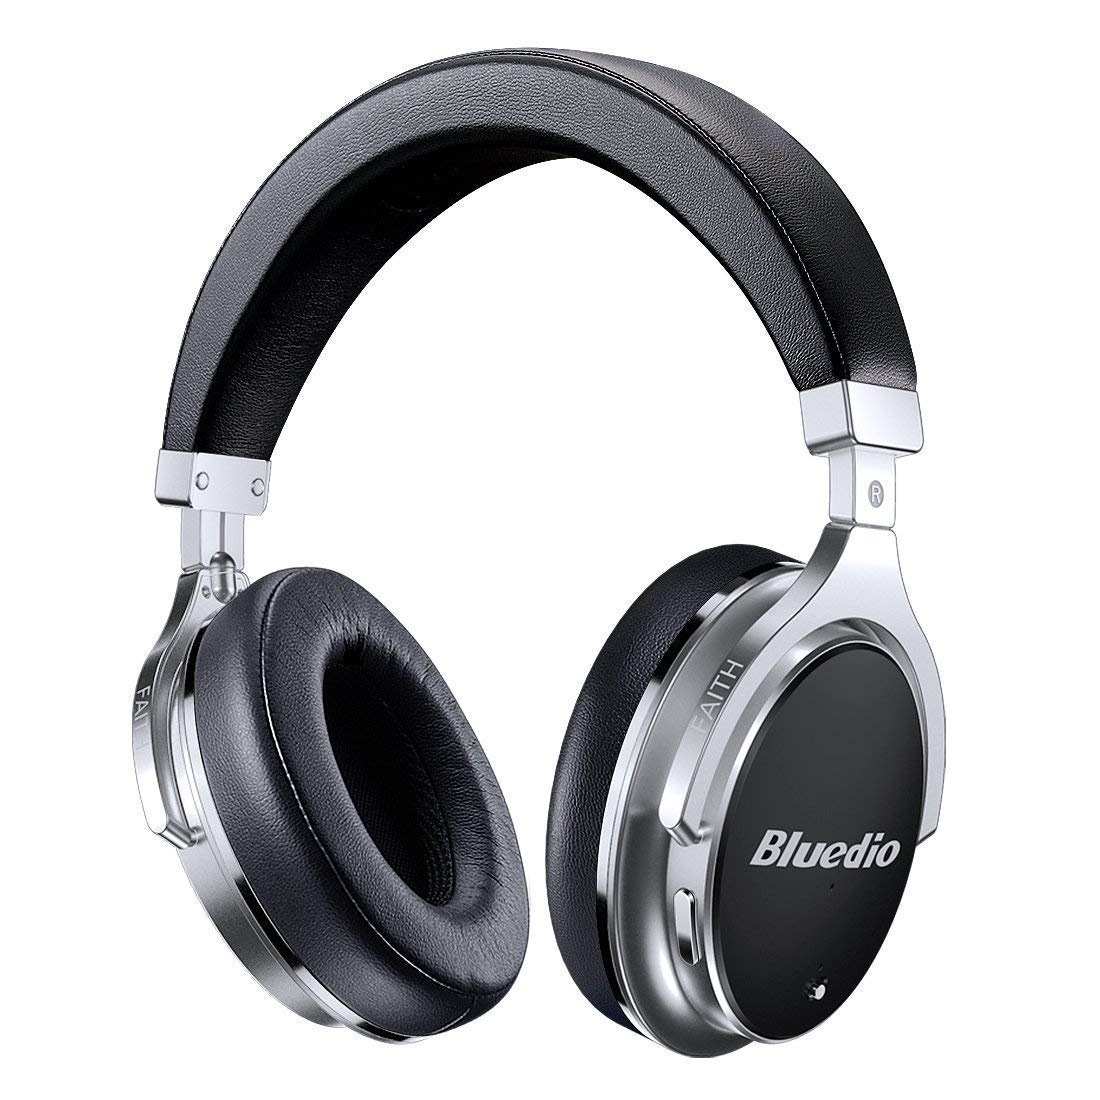 Bluedio Noise Cancelling Headphones